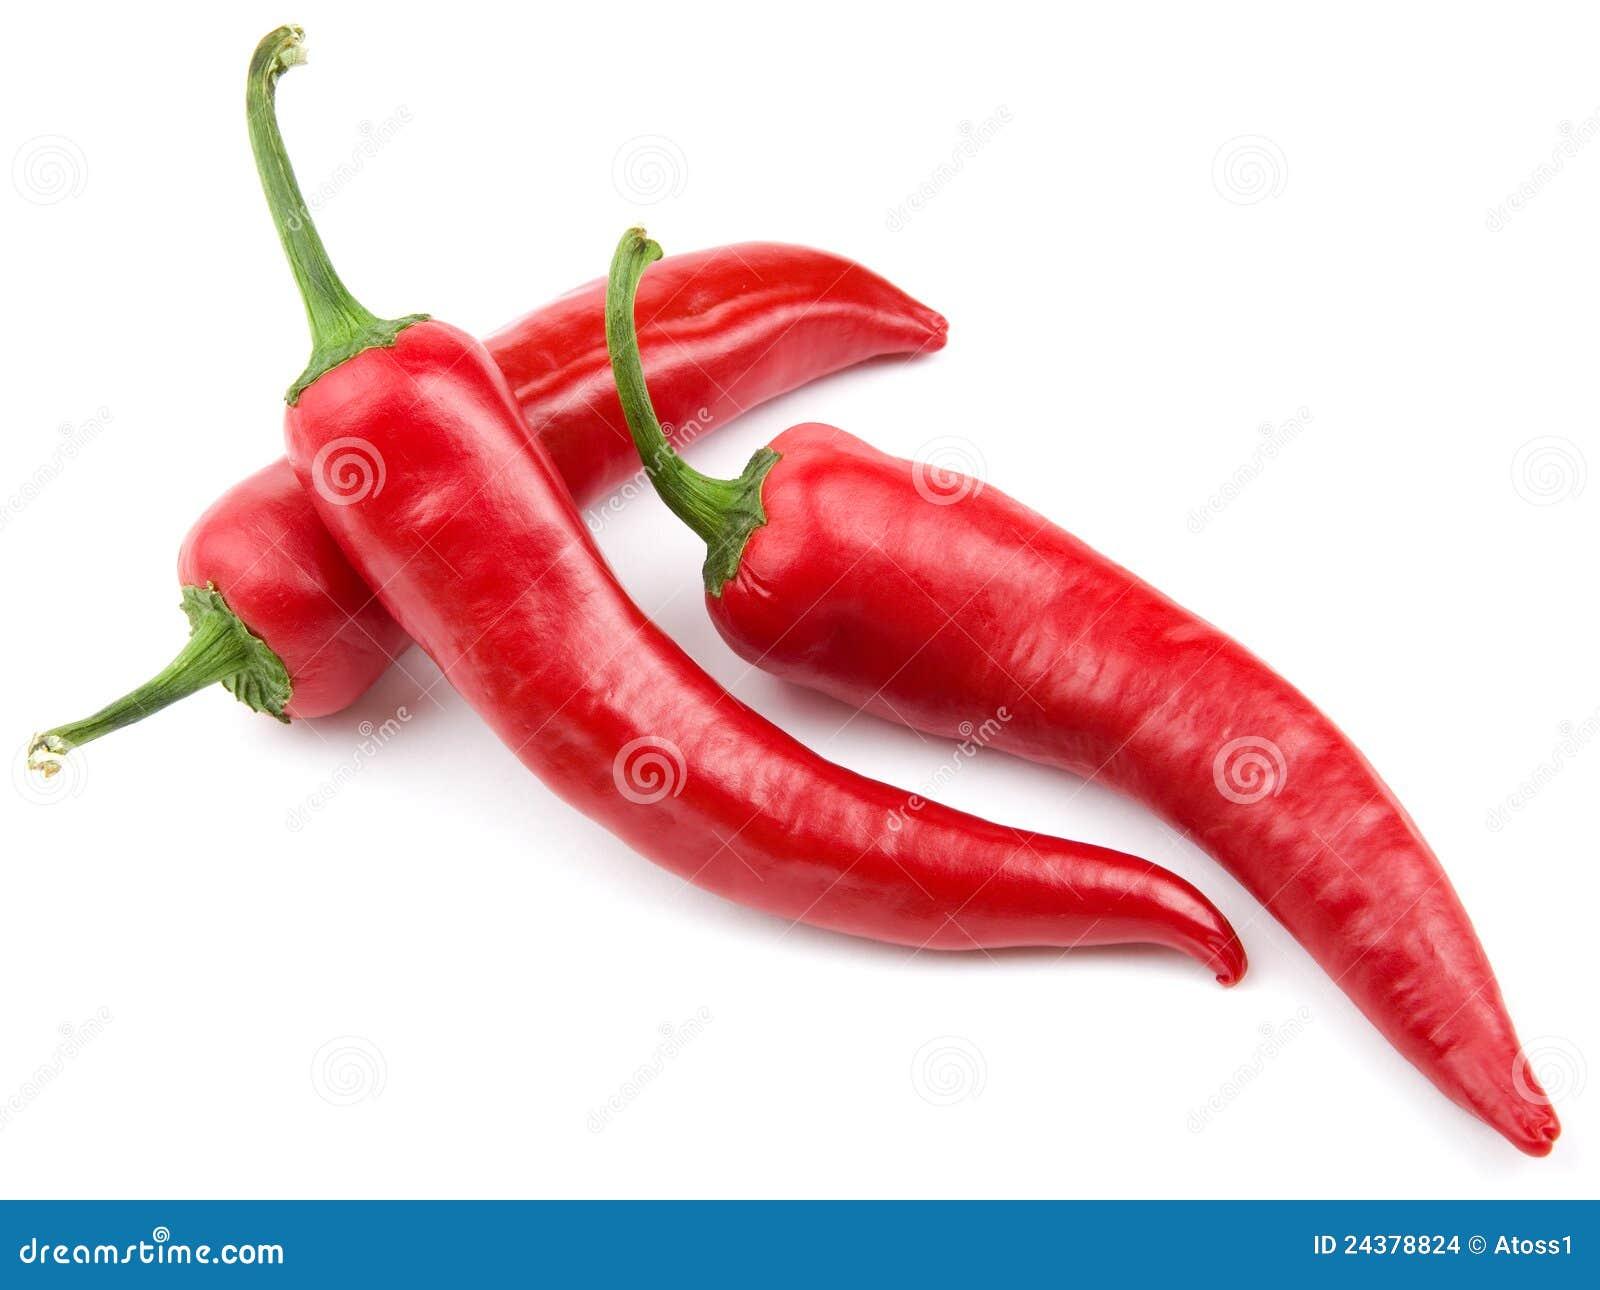 Three red hot chili pepper